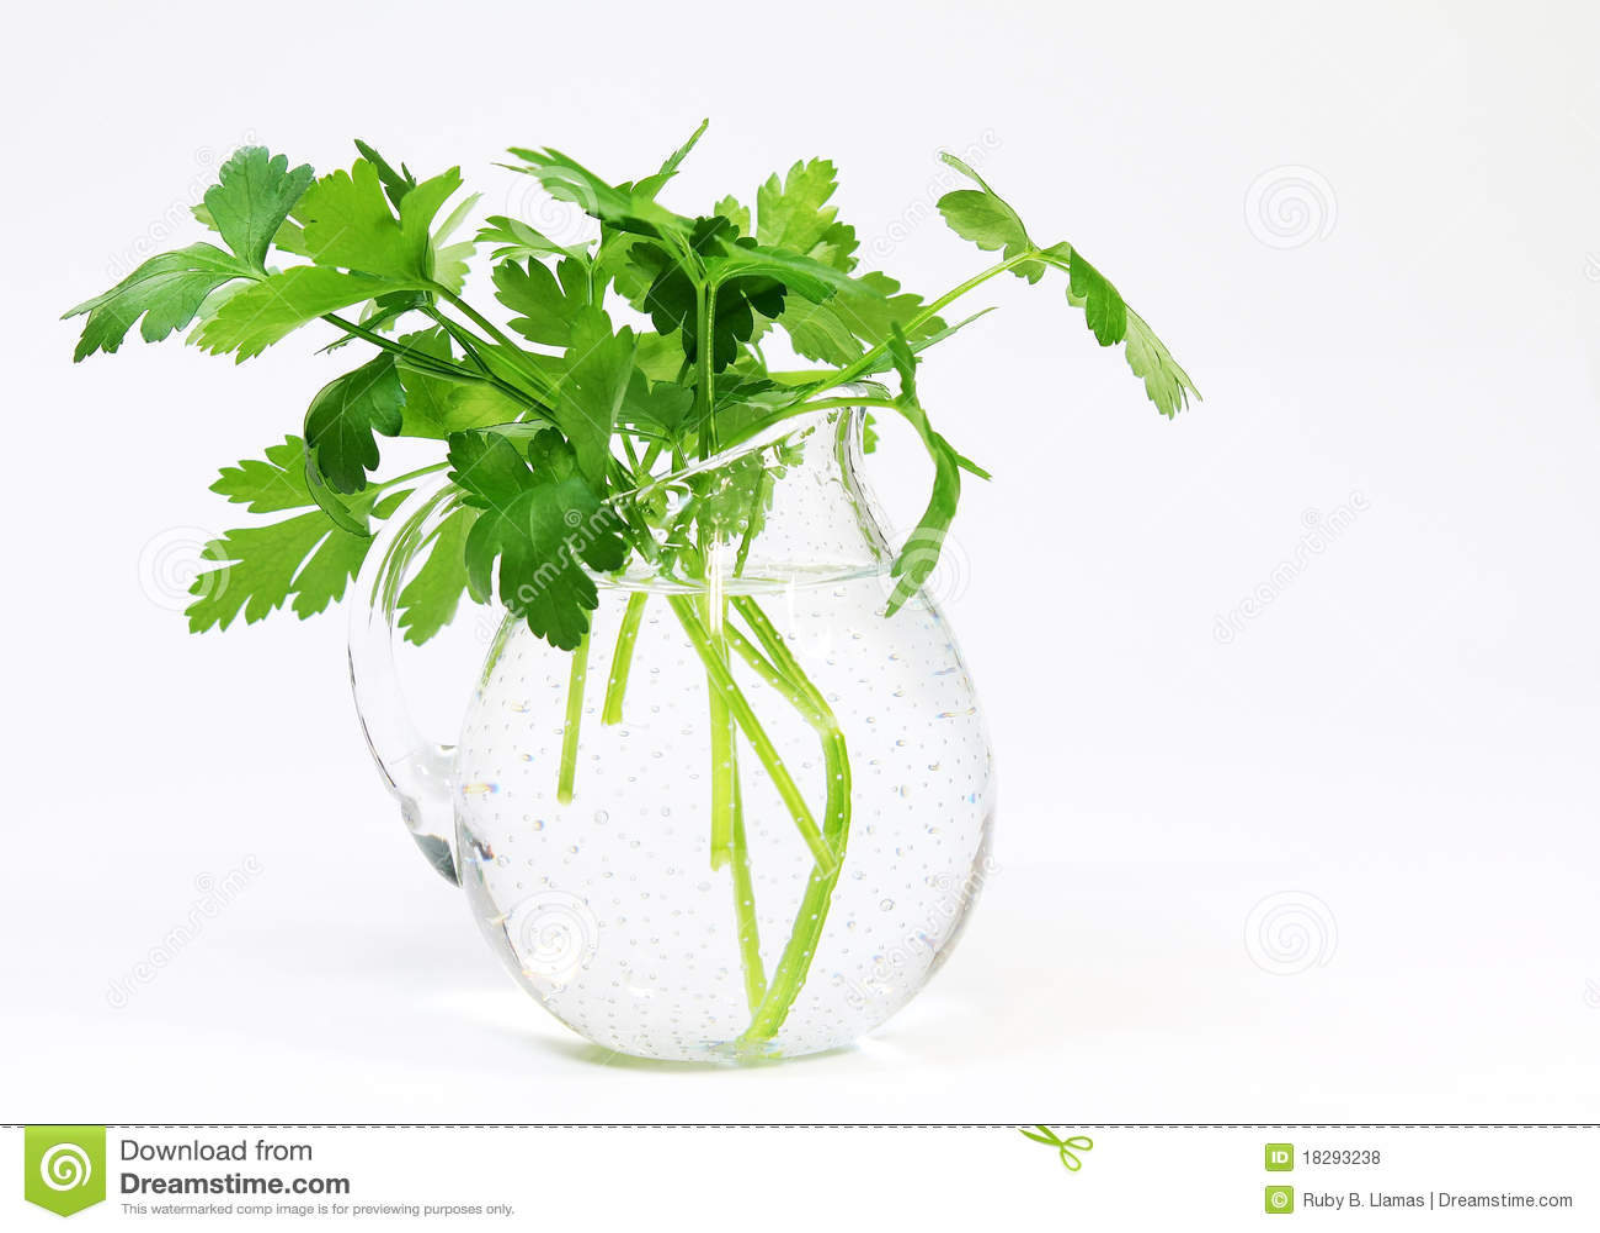 Parsley (Petroselinum crispum) Vase